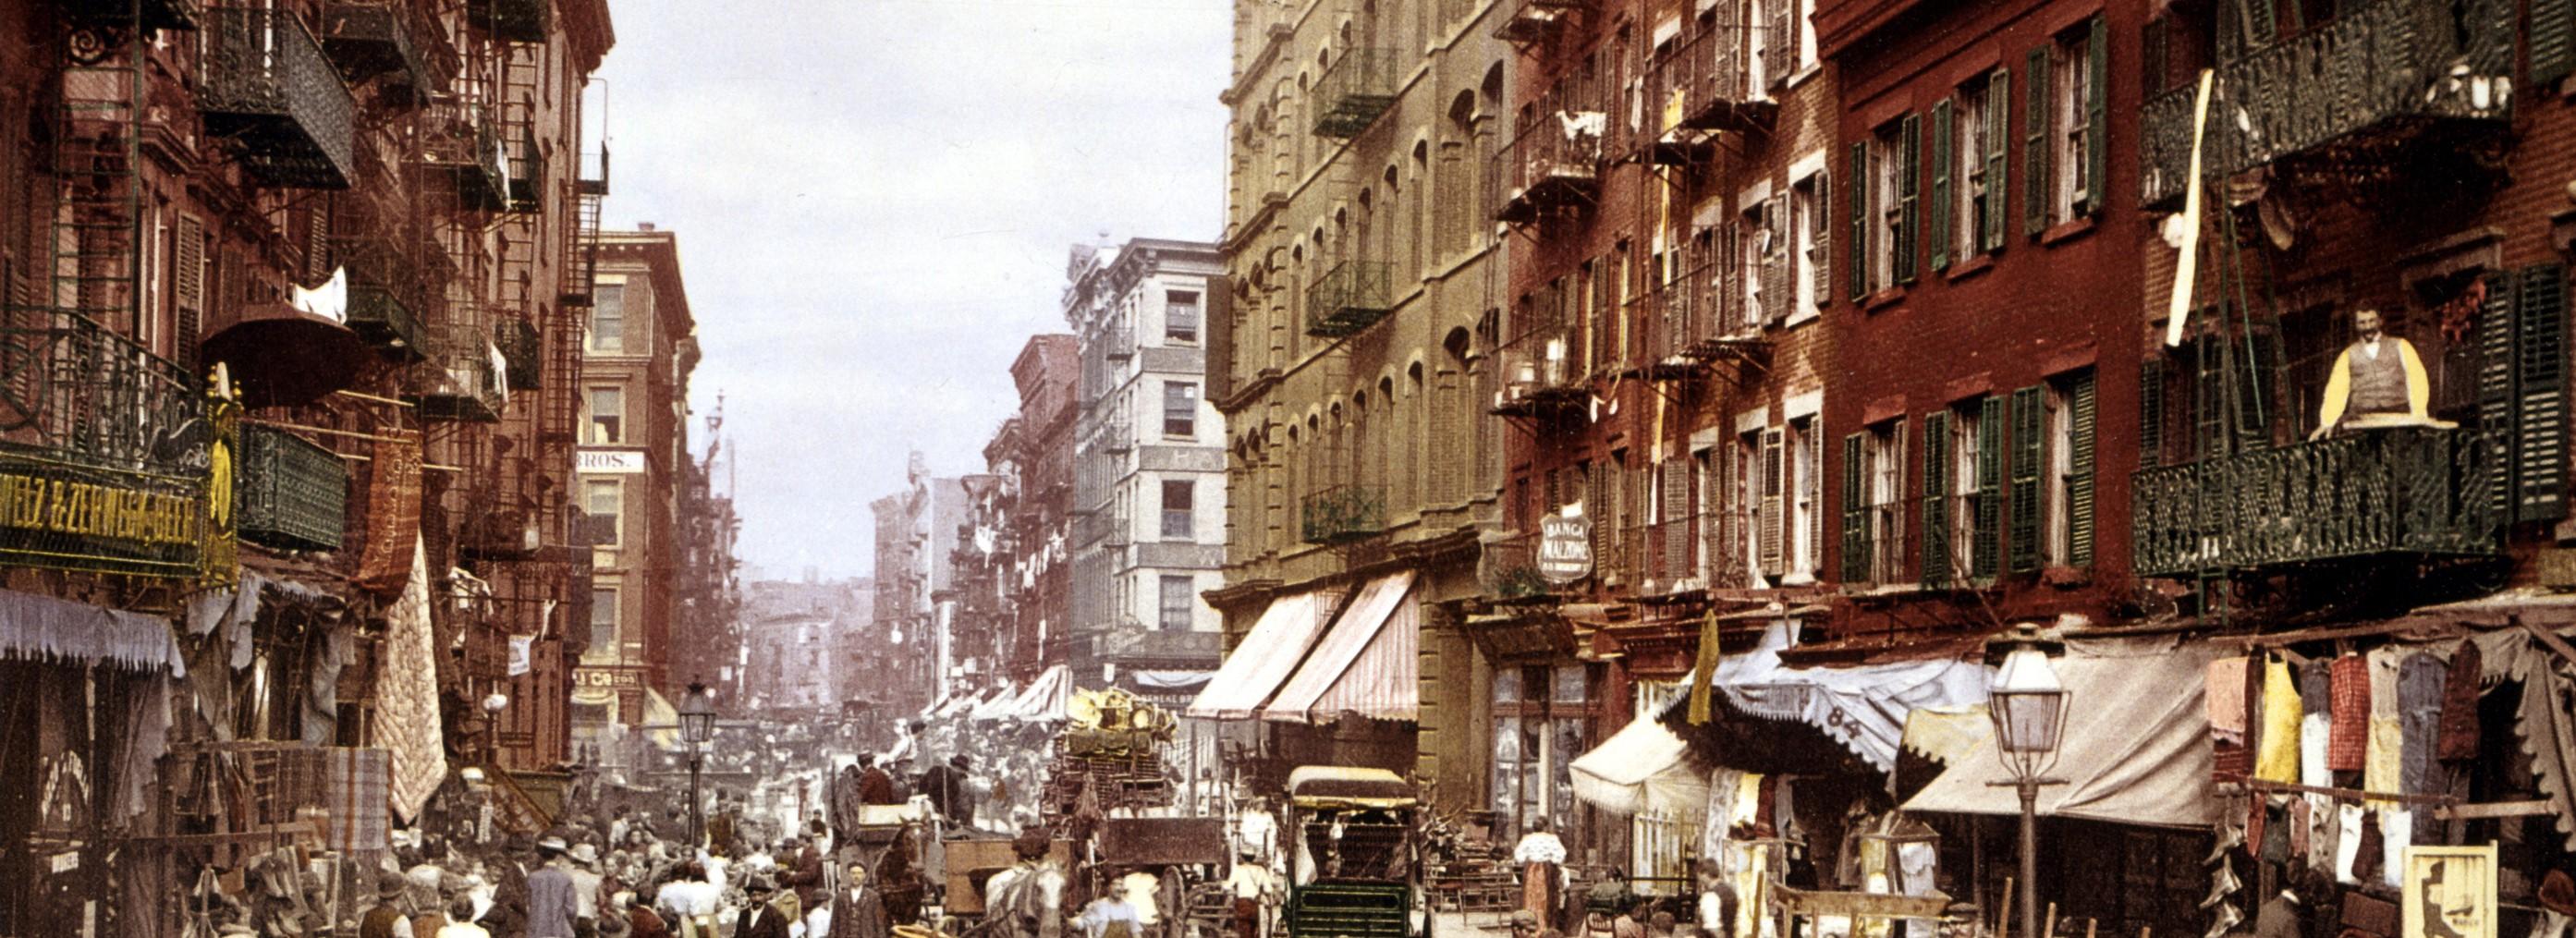 Mulberry_Street_NYC_c1900_LOC_3g04637u_edit-24hcqrx